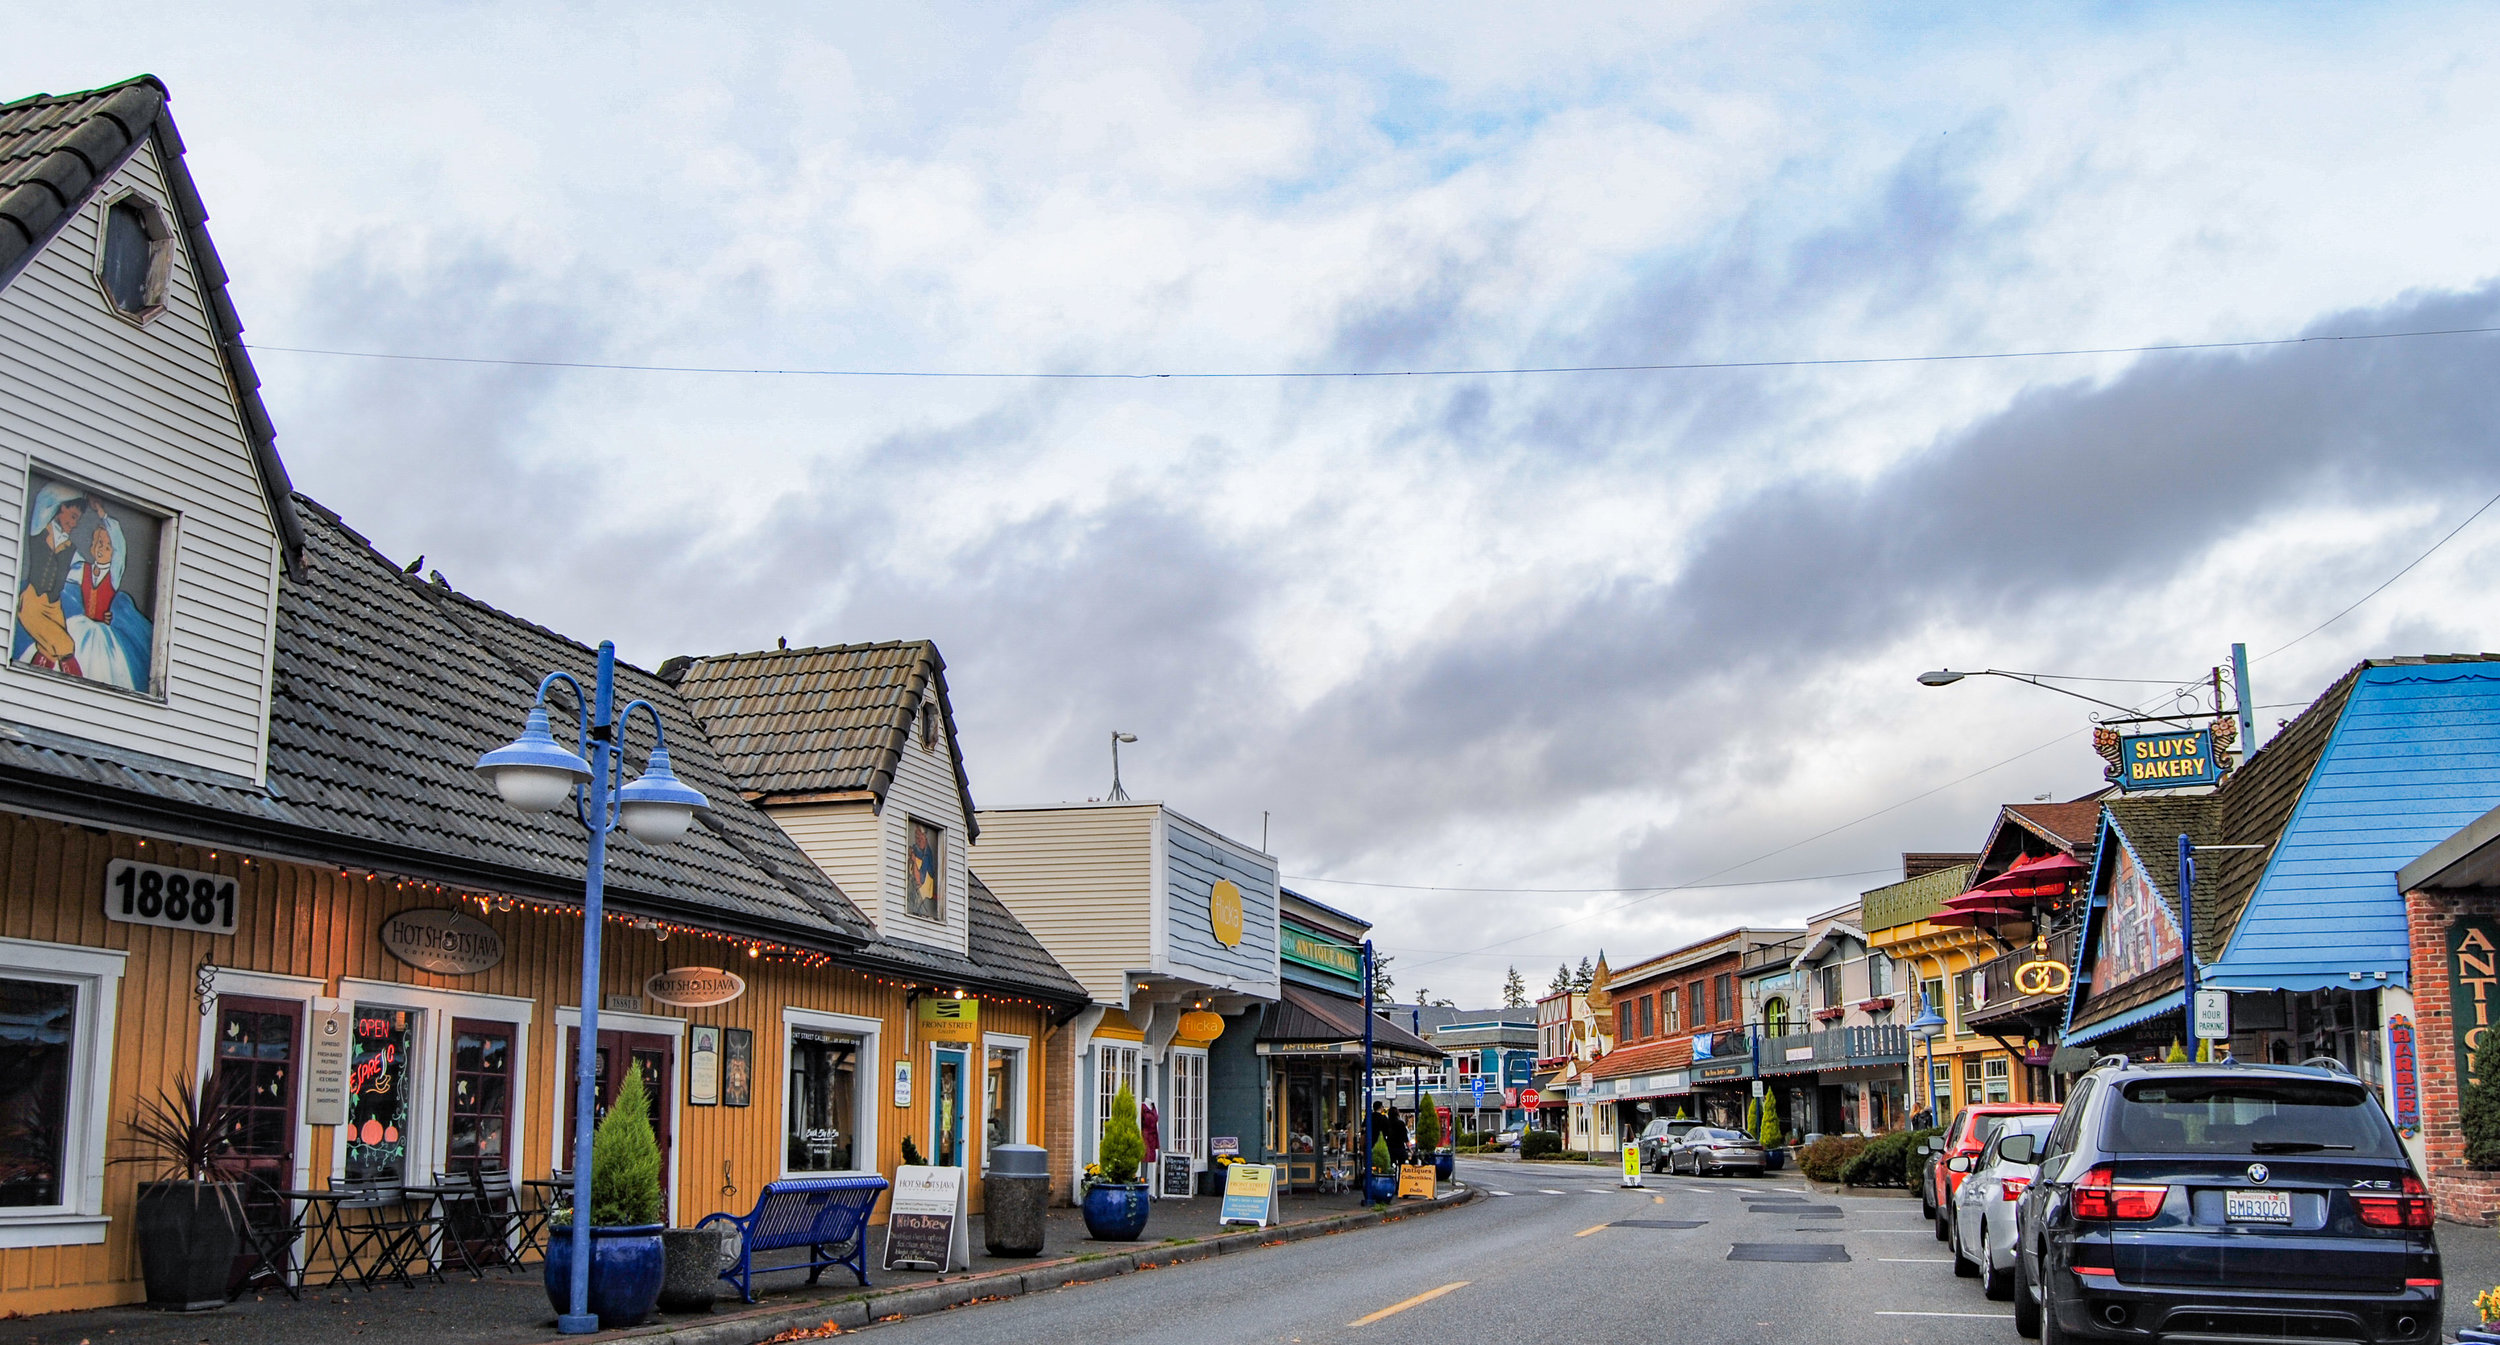 Colorful buildings, mimicking costal Scandinavian homes